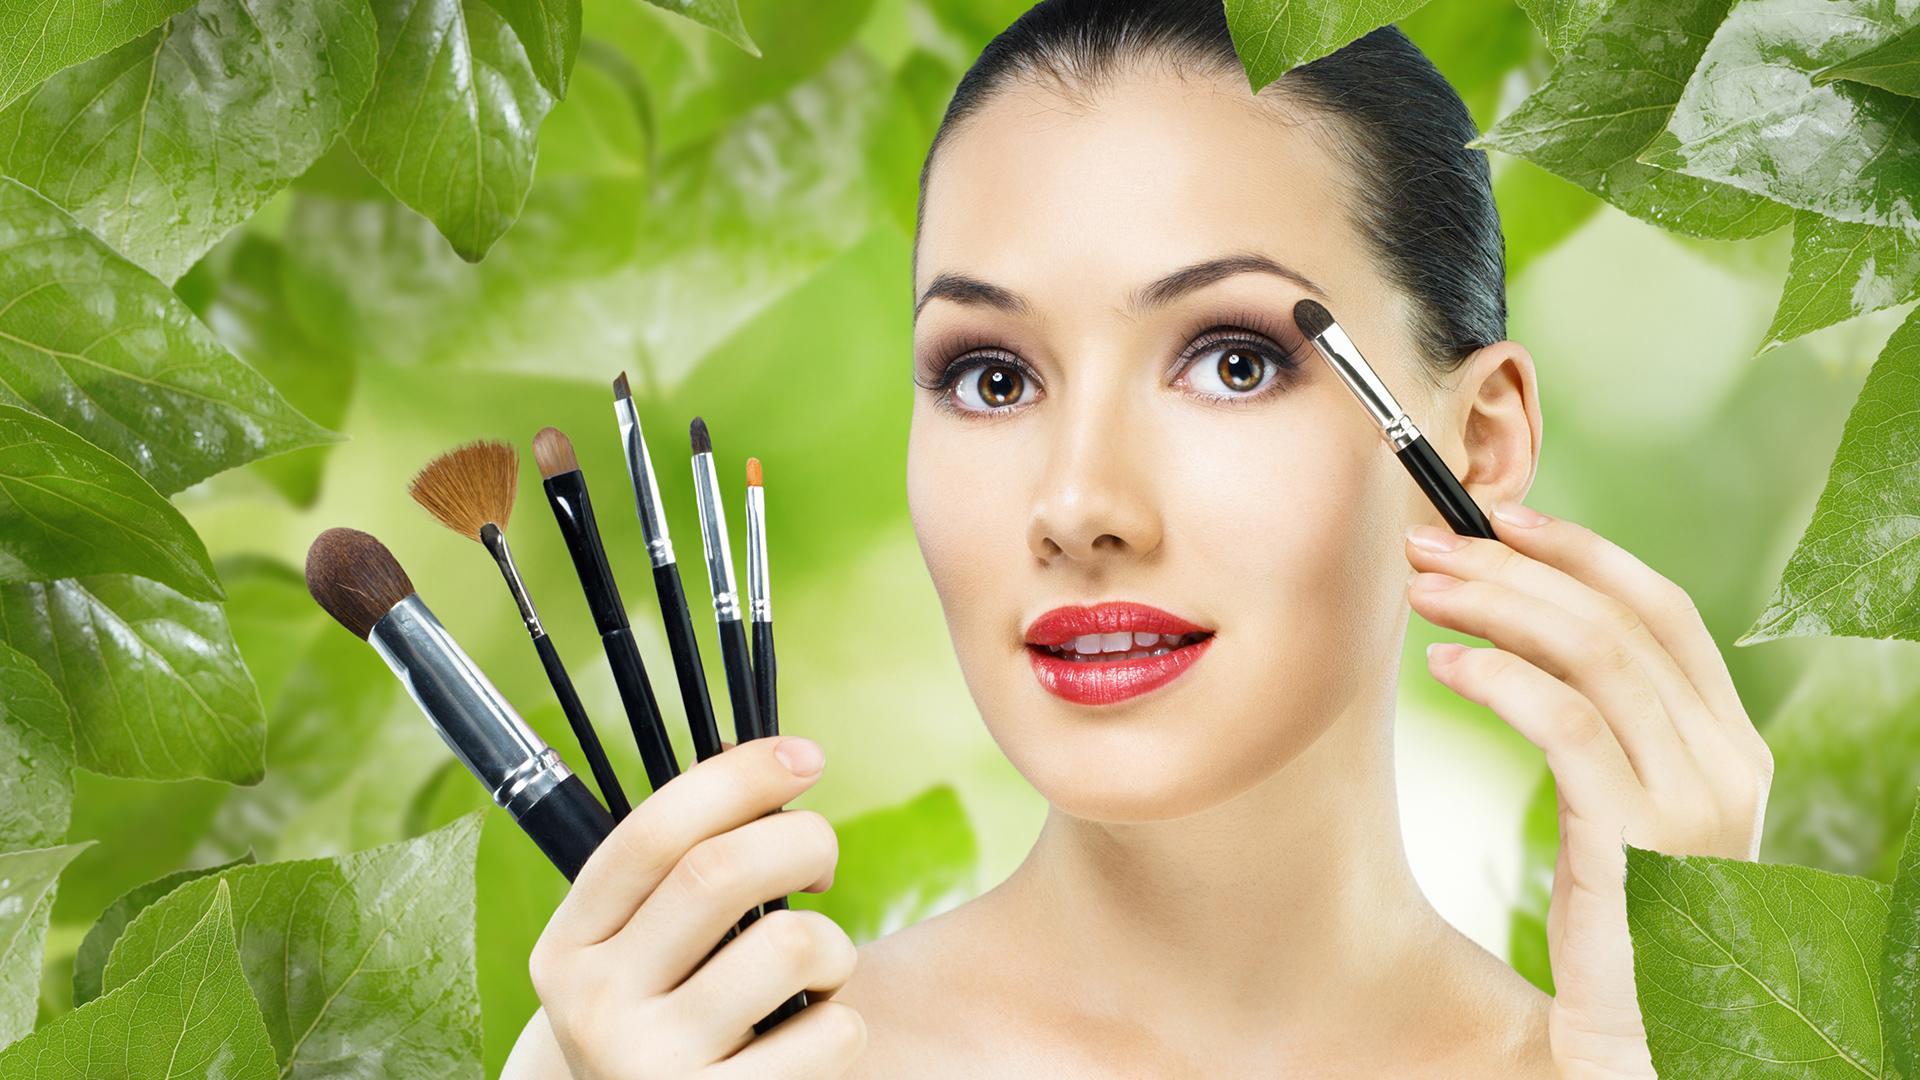 Julie Photo Makeup Software Free Download